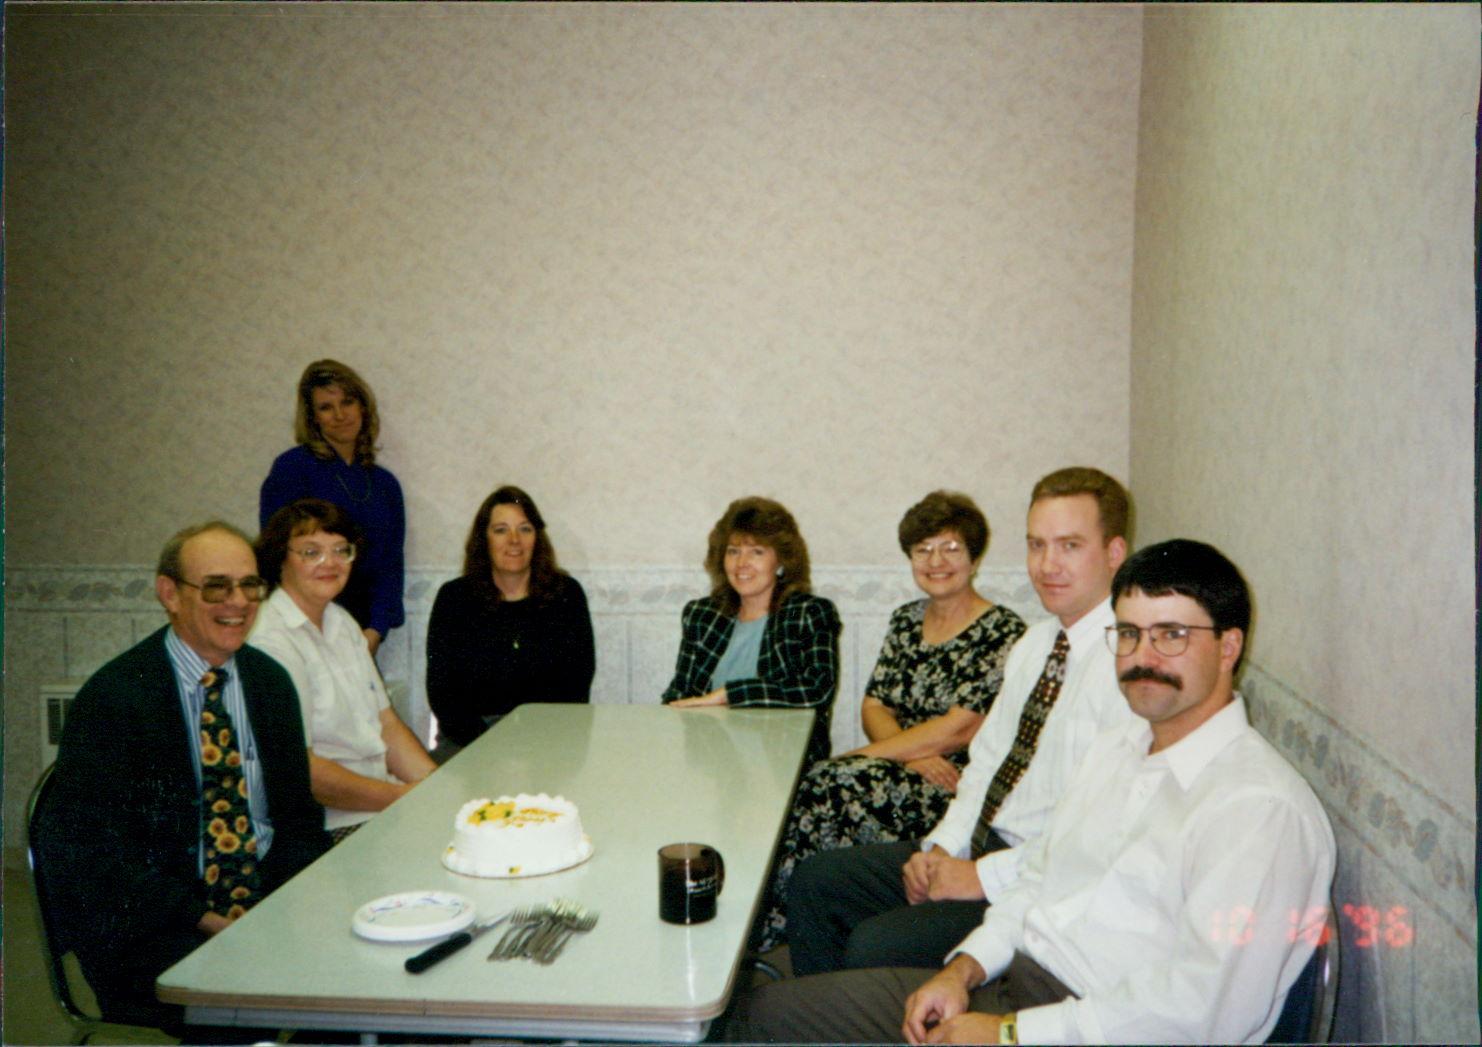 Seydel, Brenda Swart, Amber Yates, Pam Profily, Sherri McDonald, Judy Clemens, Dan McDonald & Poe - 1996